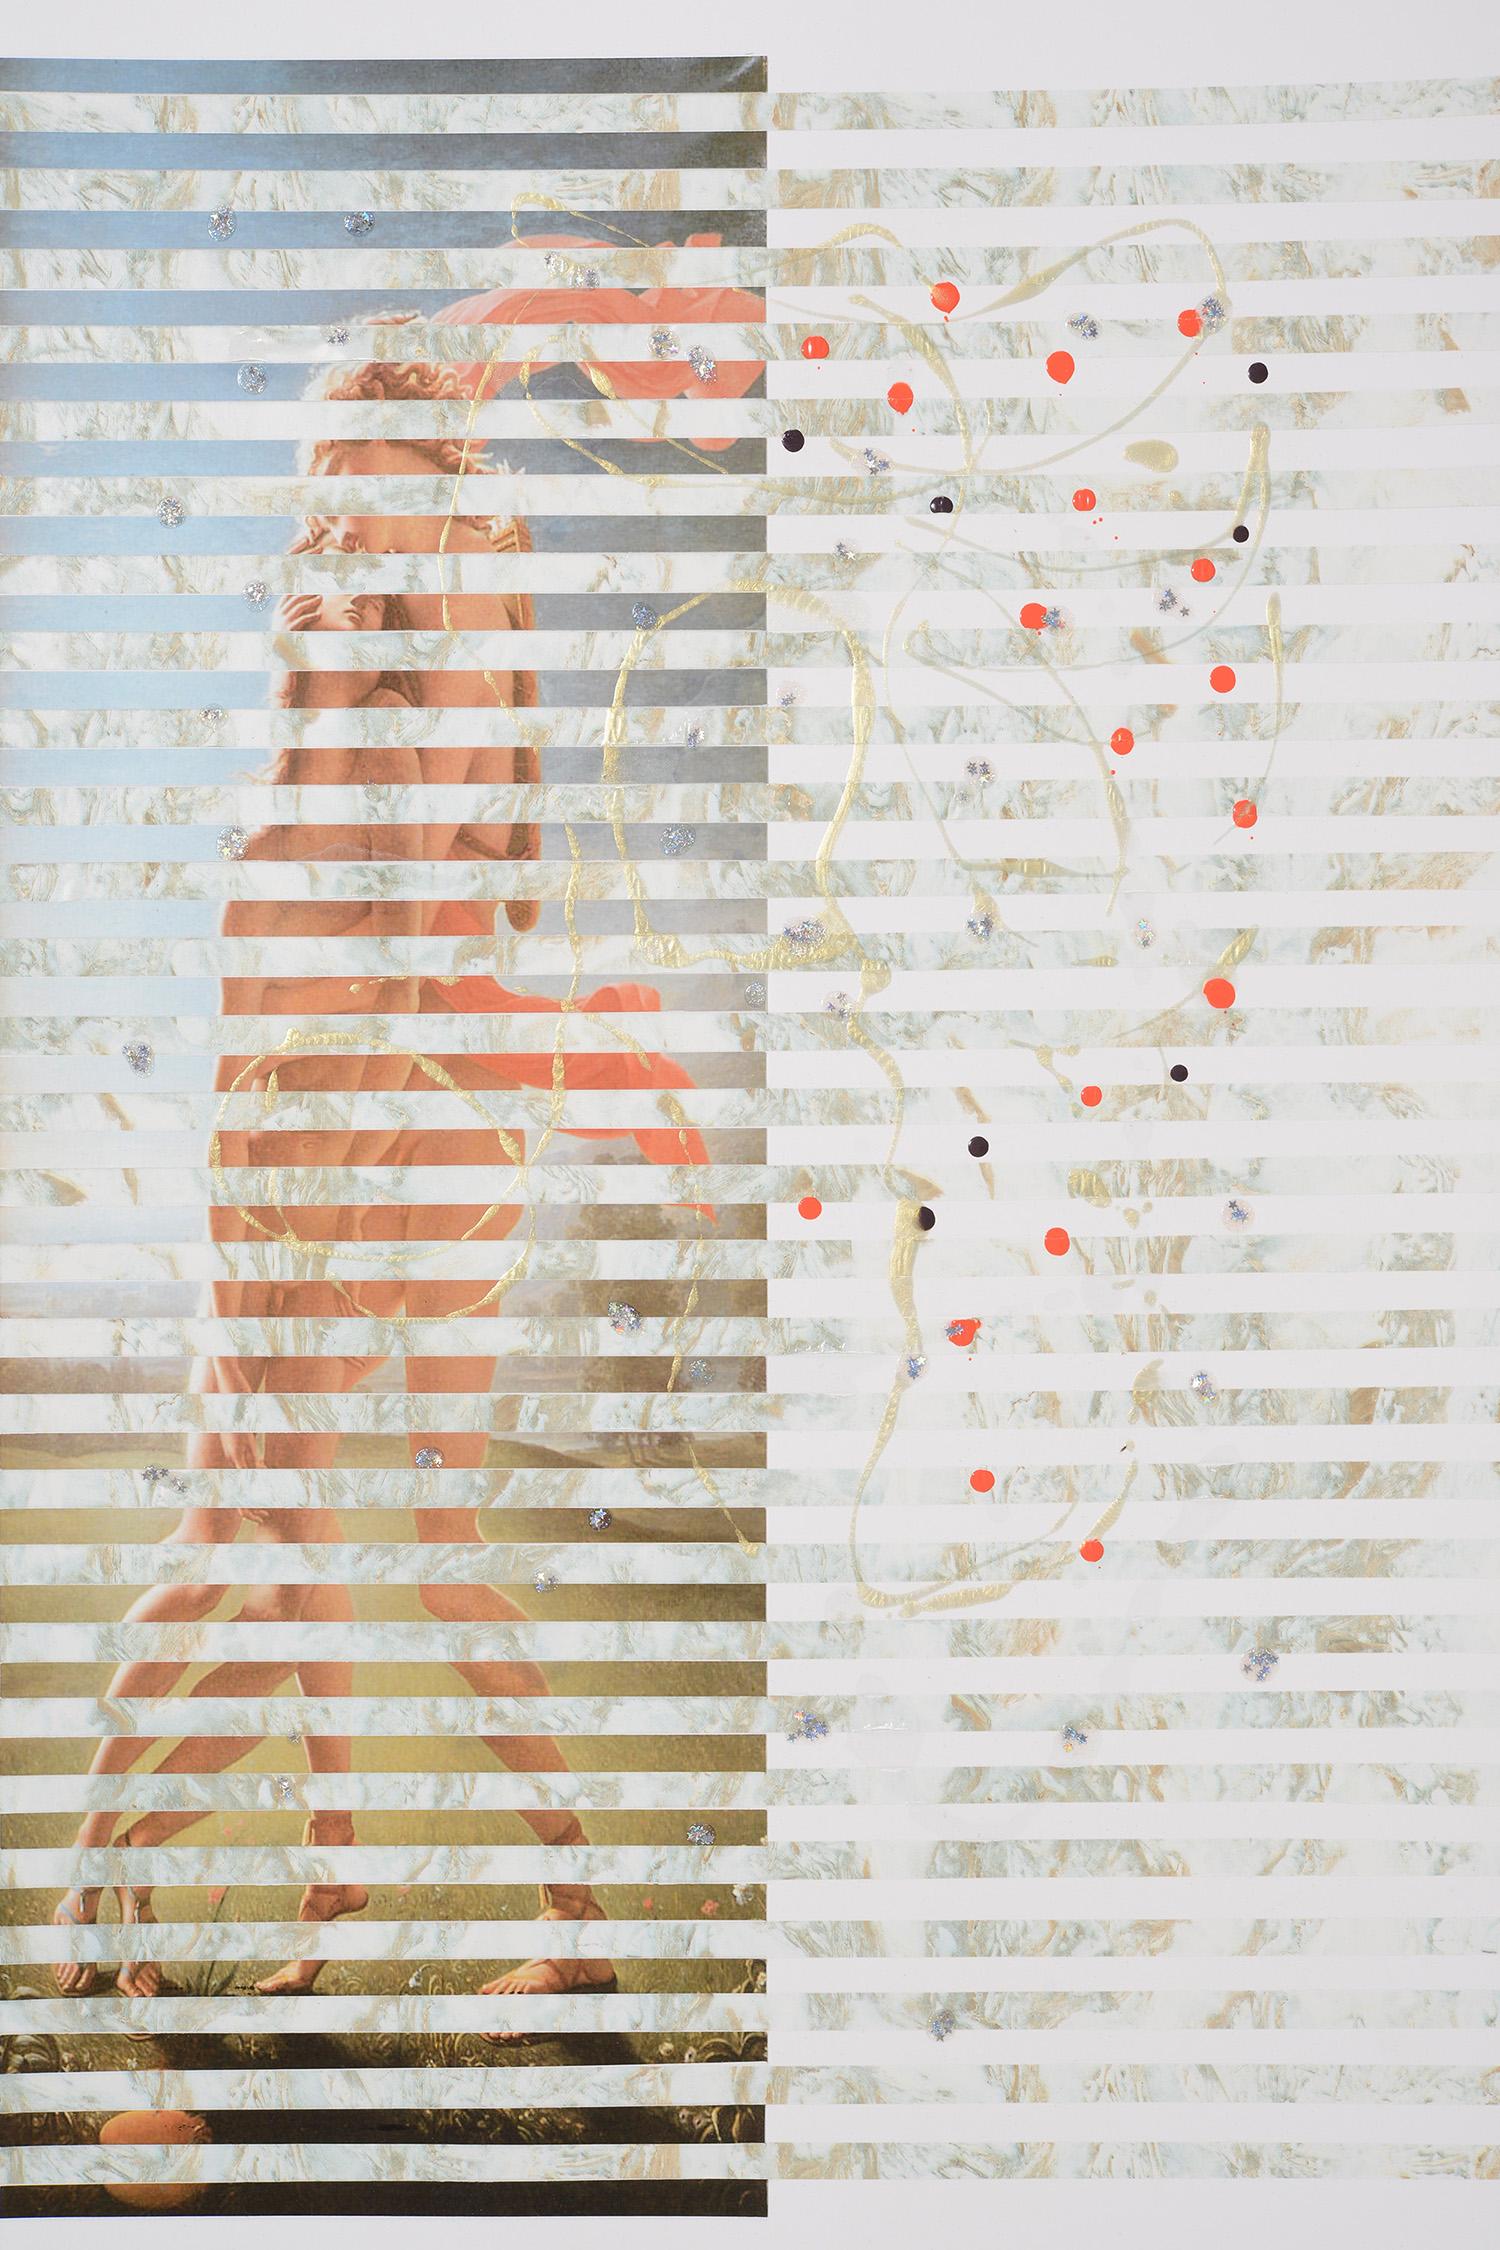 Markues, Falling Stars, 2013, mixed media on paper, 60 x 40 cm.jpg